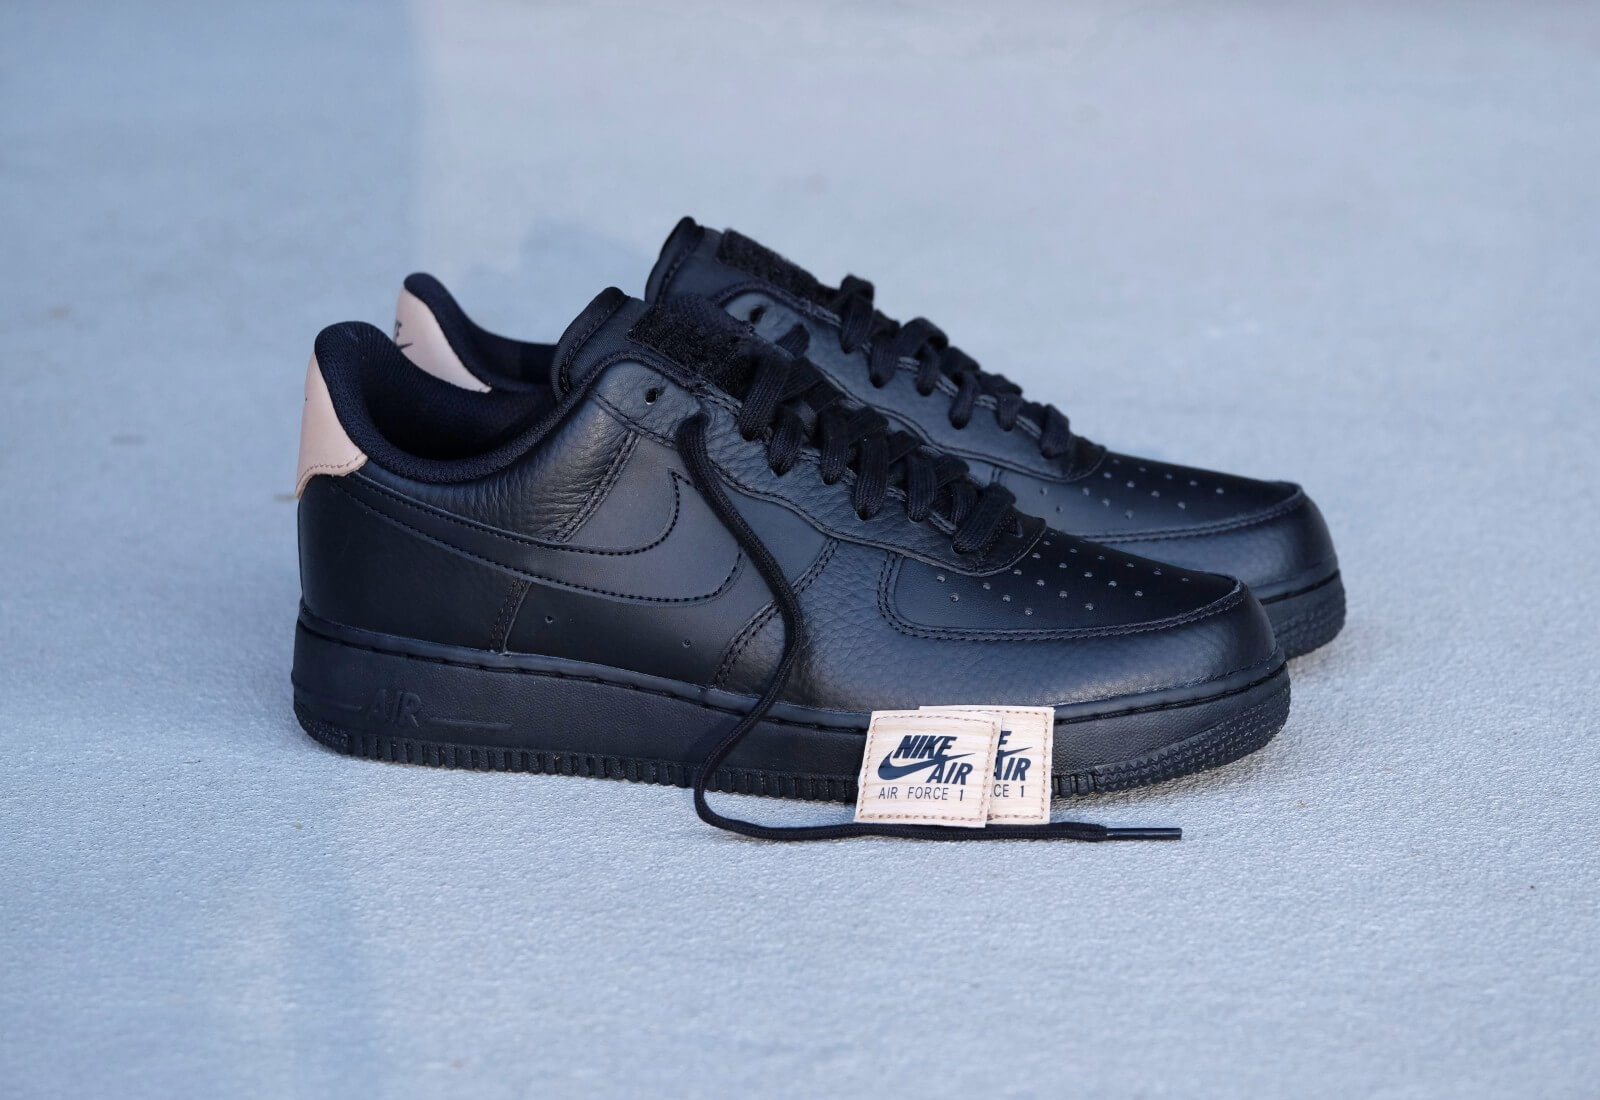 Nike Air Max Force 1'07 Lv8 BlackBlack 718152 016